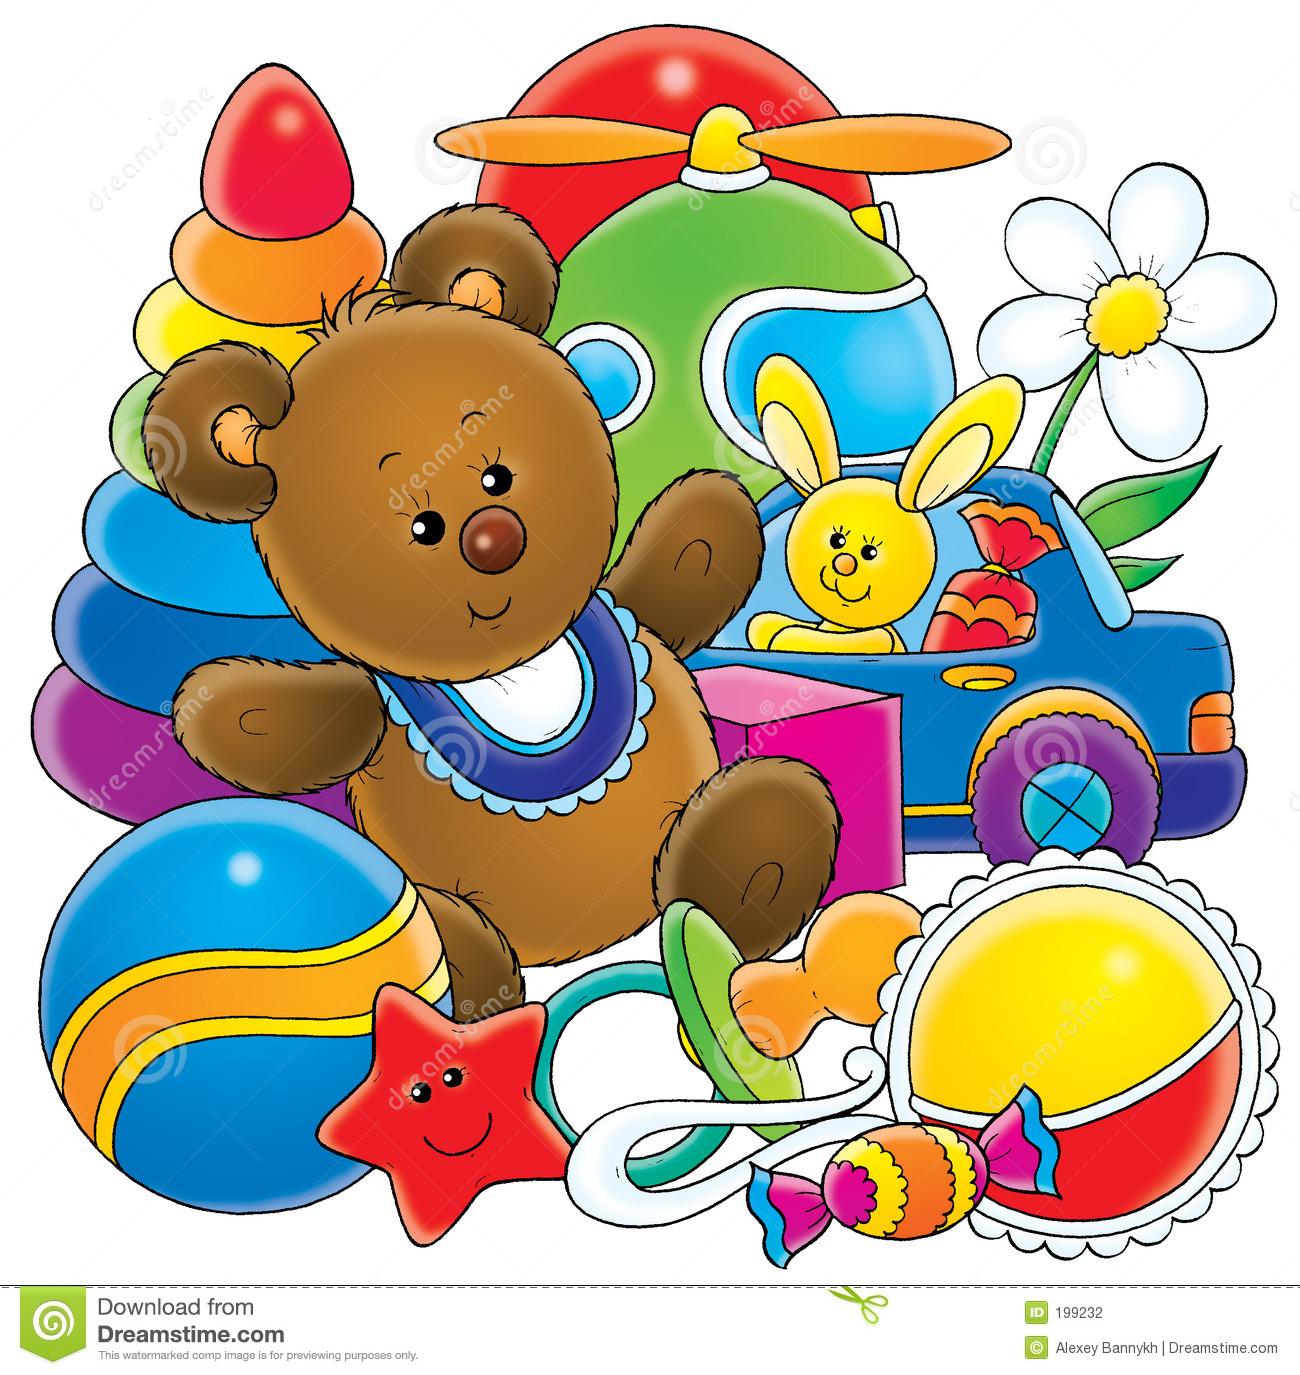 Toys clipart #17